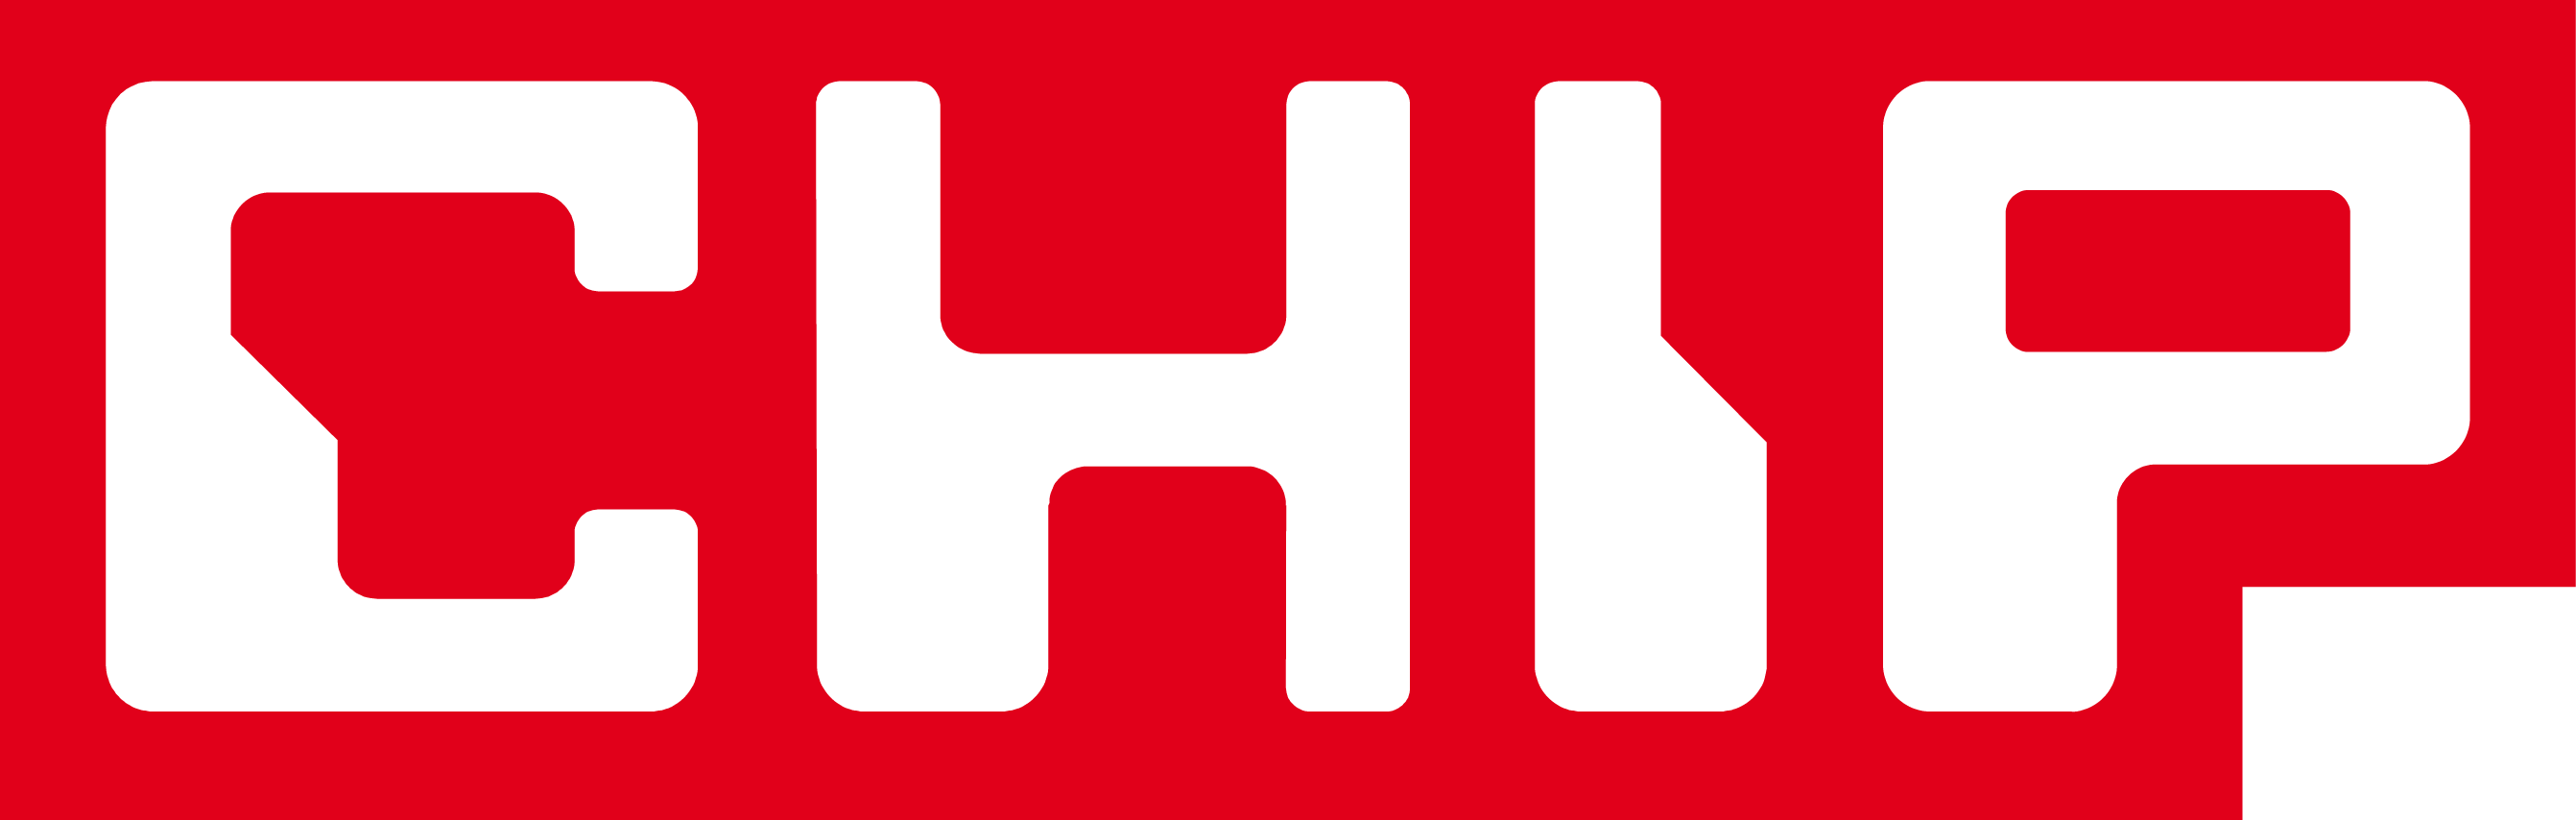 Chip Logo [Magazine] png